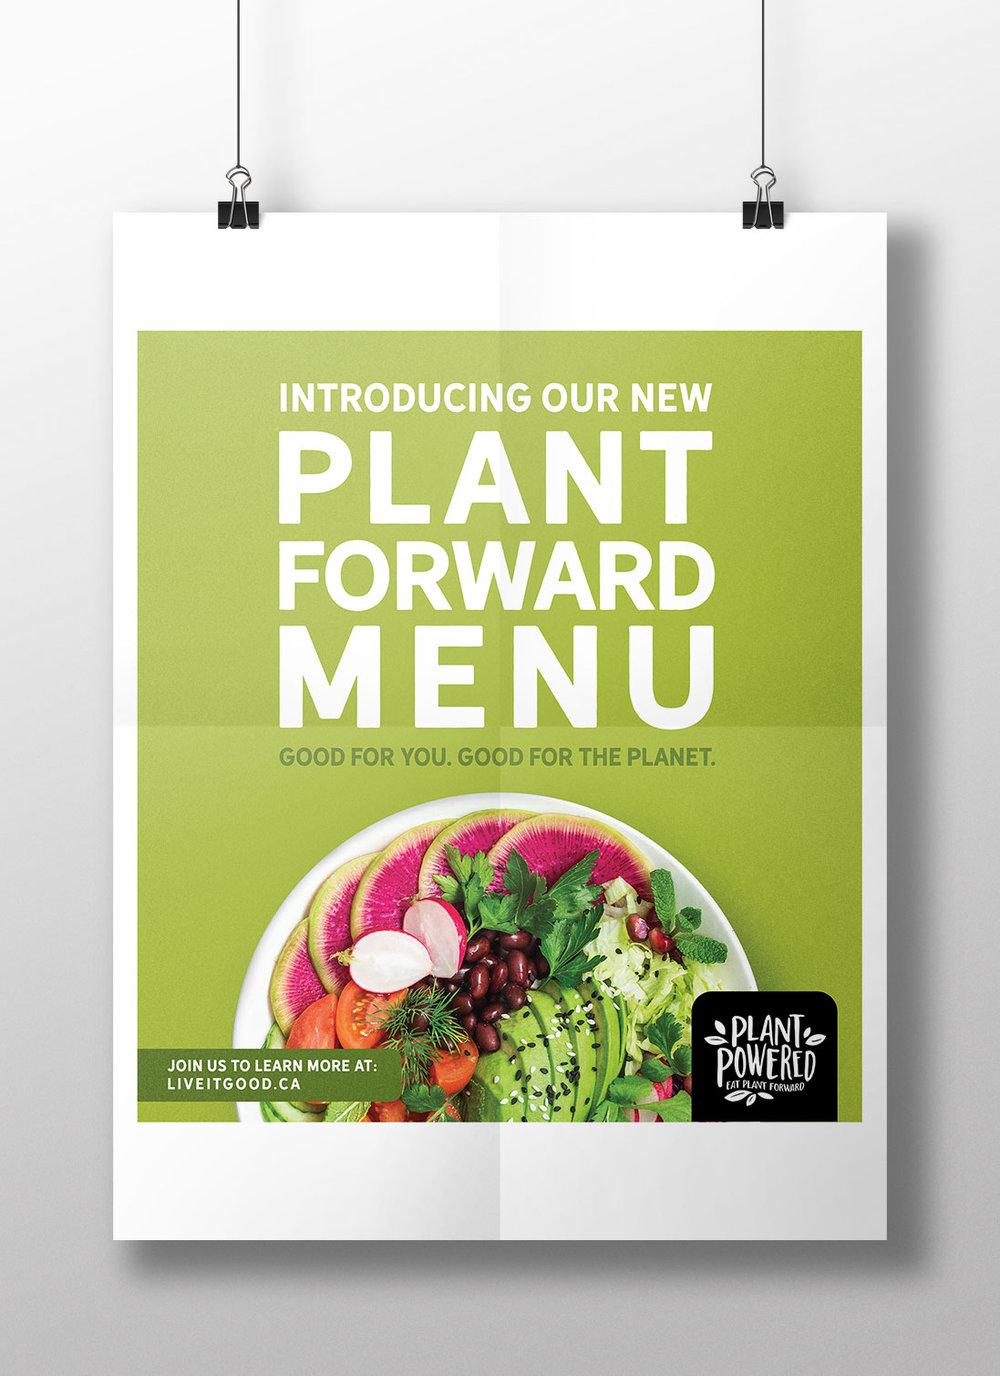 Aramark_Plant-Powered-Campaign_poster.jpg